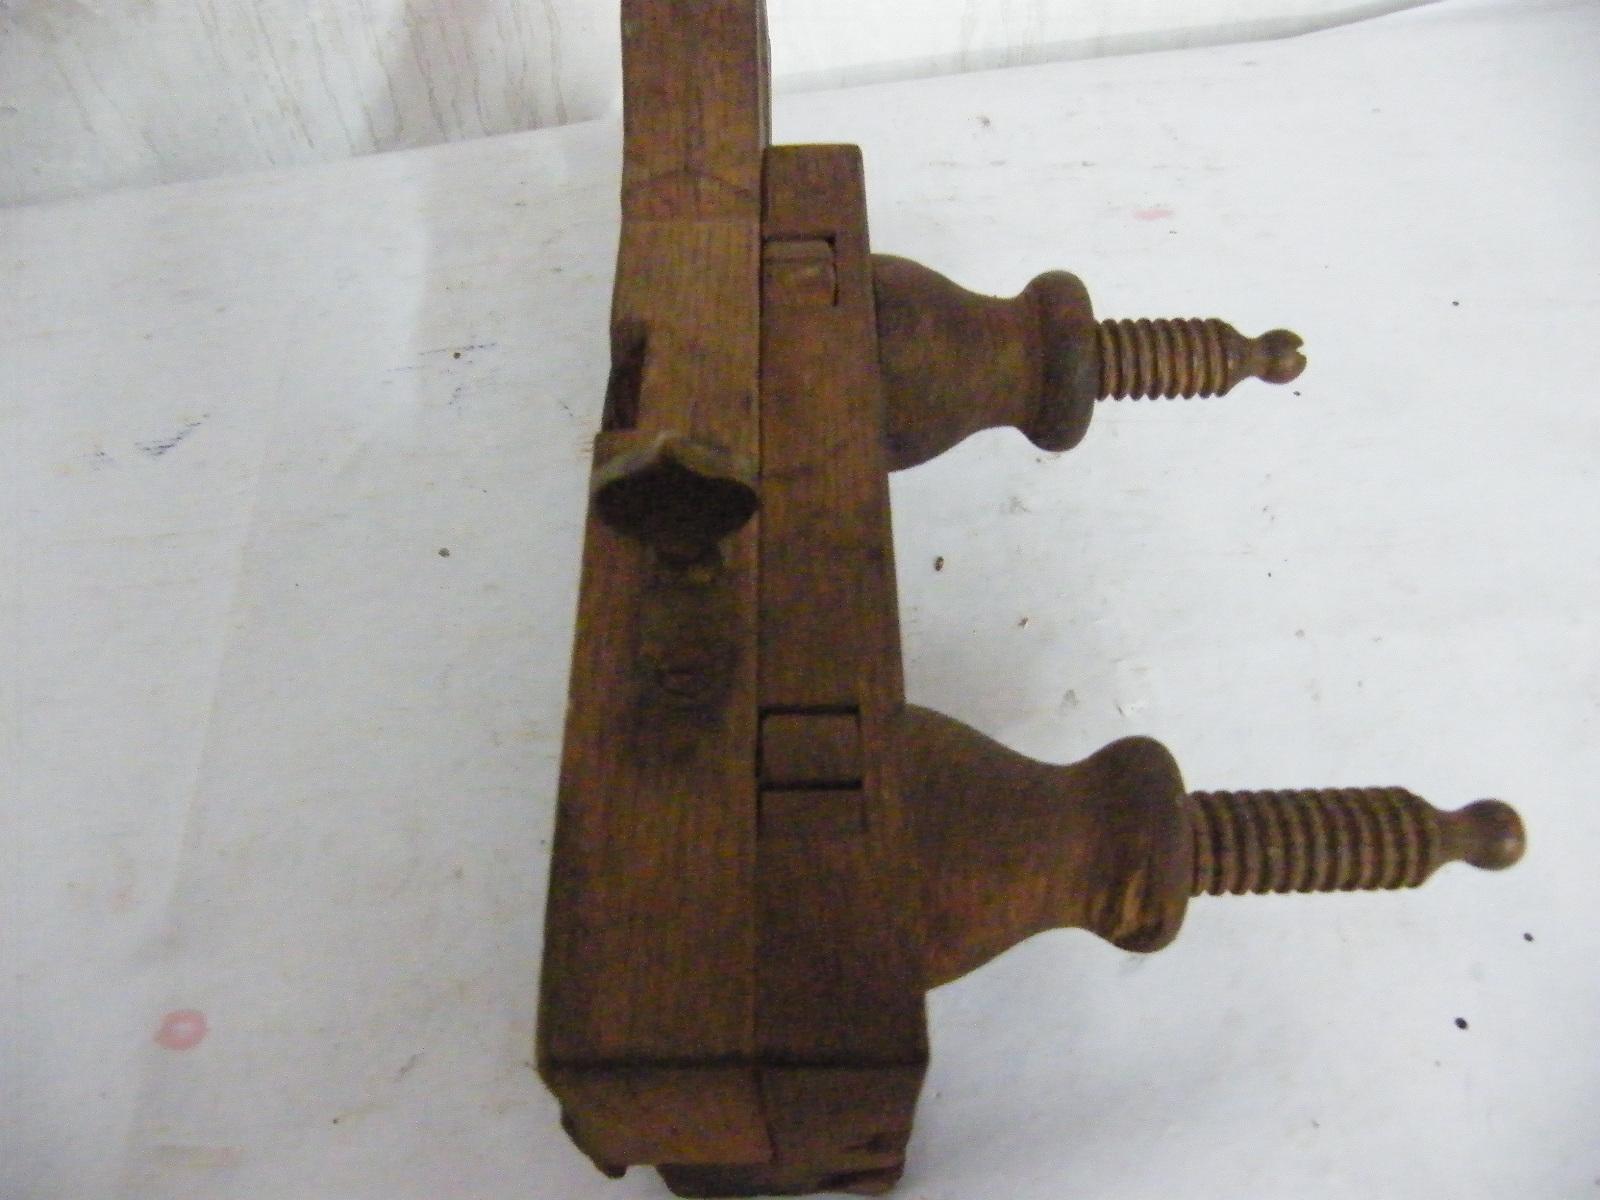 Cepillo de carpintero cosas del abuelo - Cepillos electricos de carpintero ...